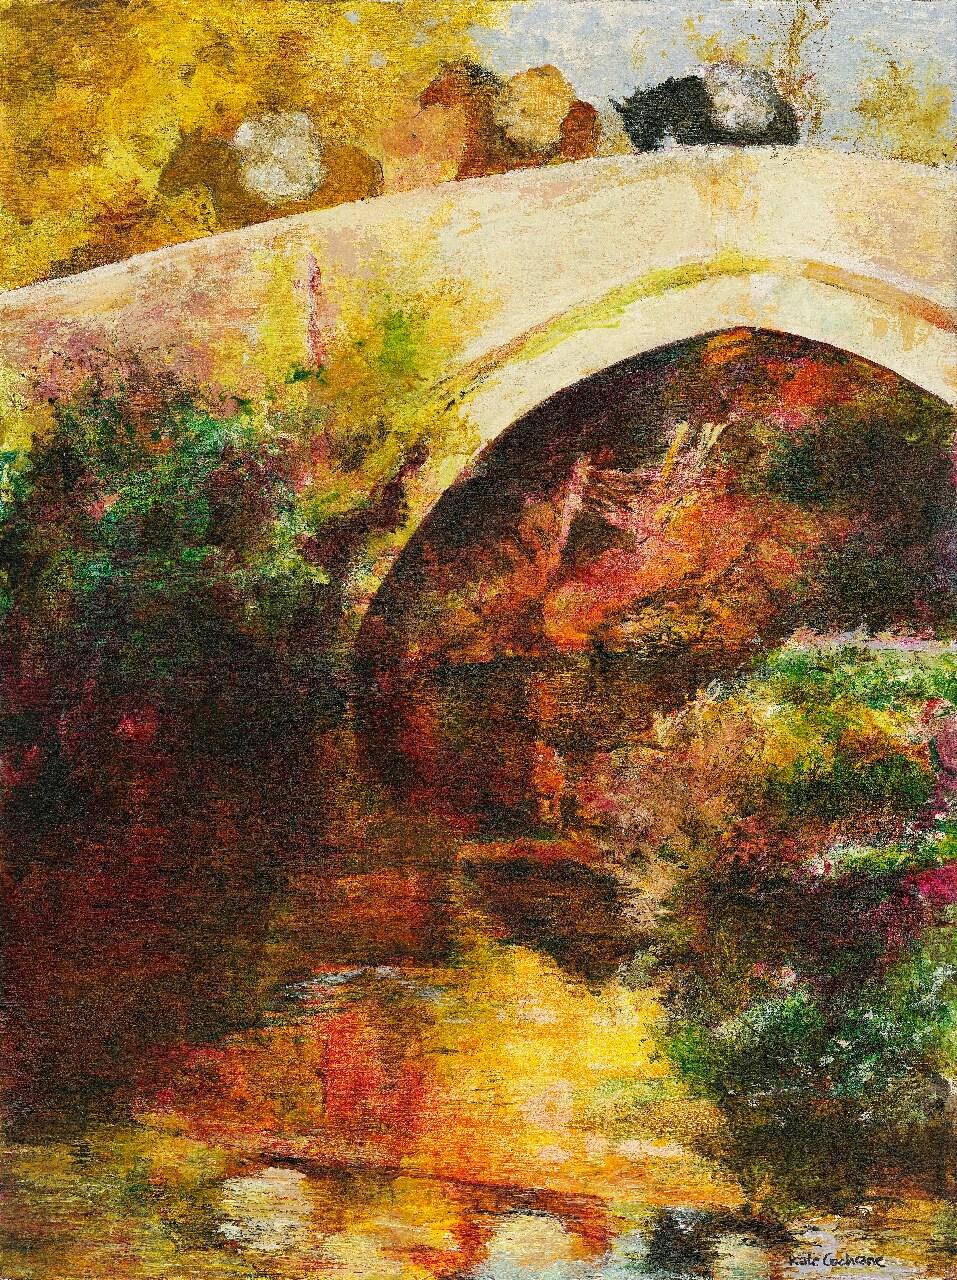 'Bow Bridge', Bruton